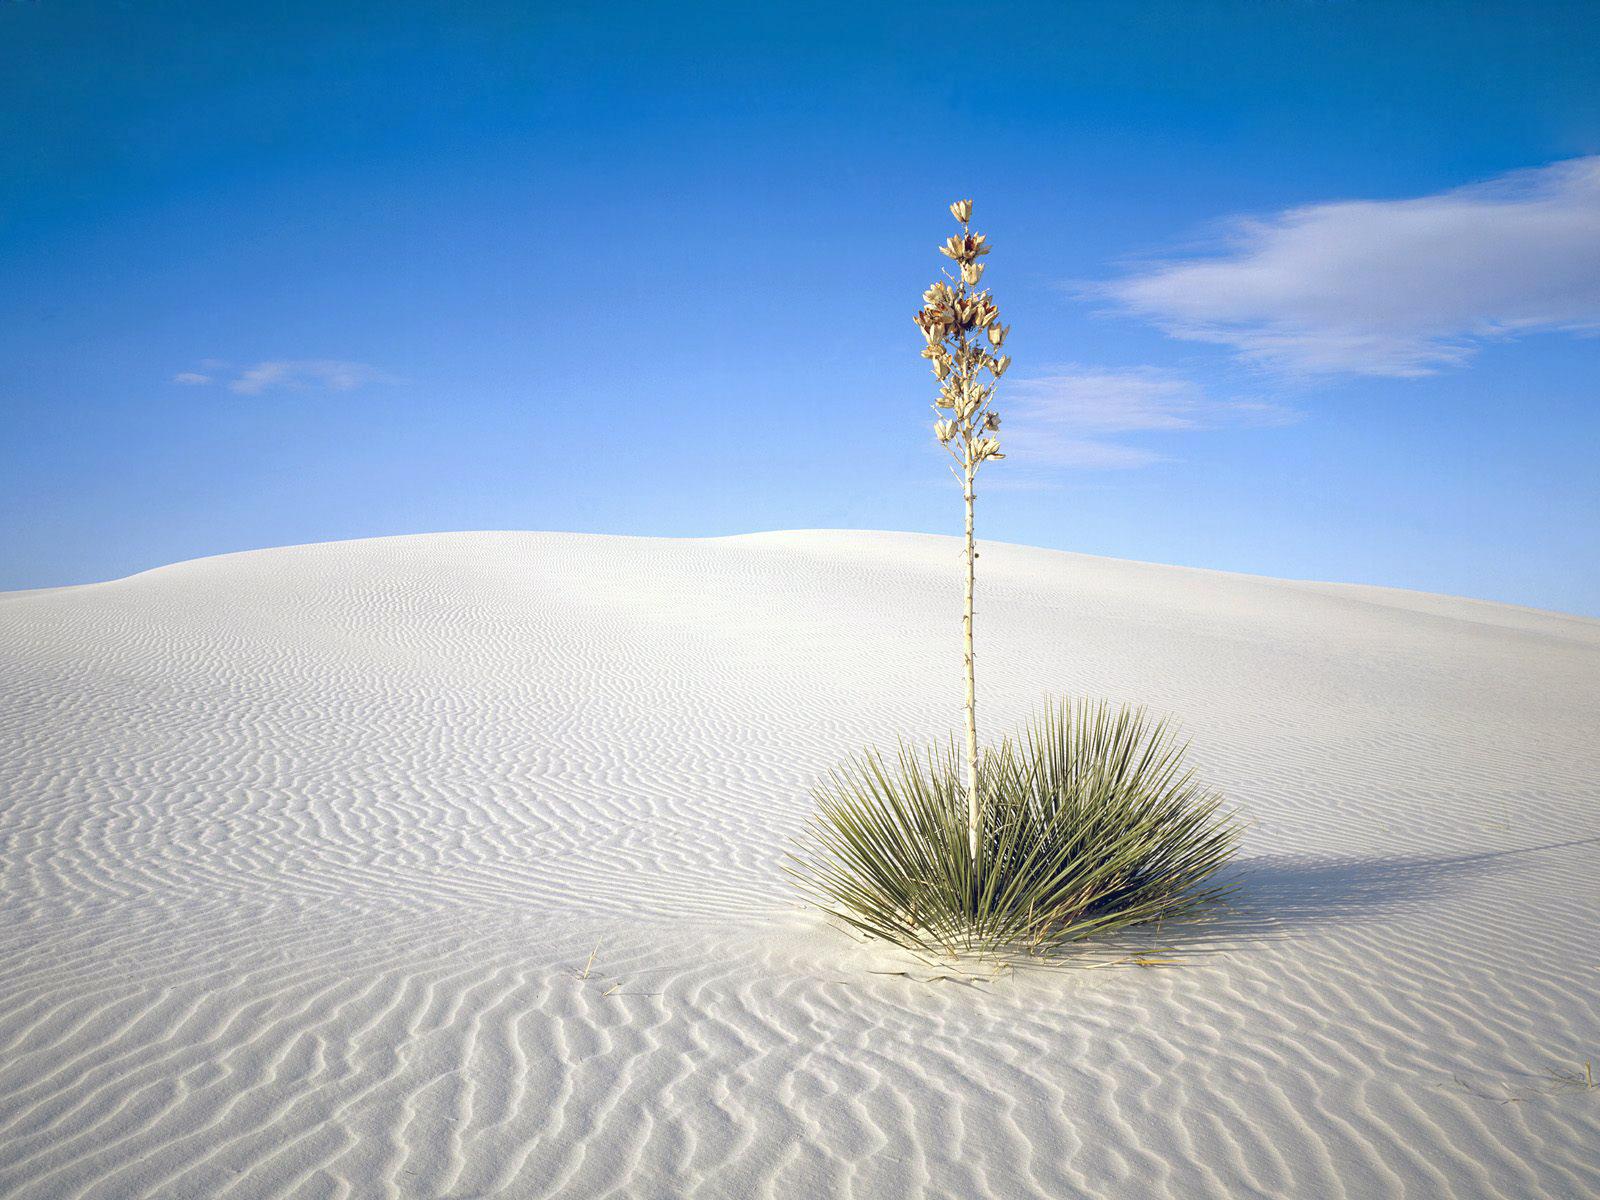 survivor desert wallpapers - photo #27